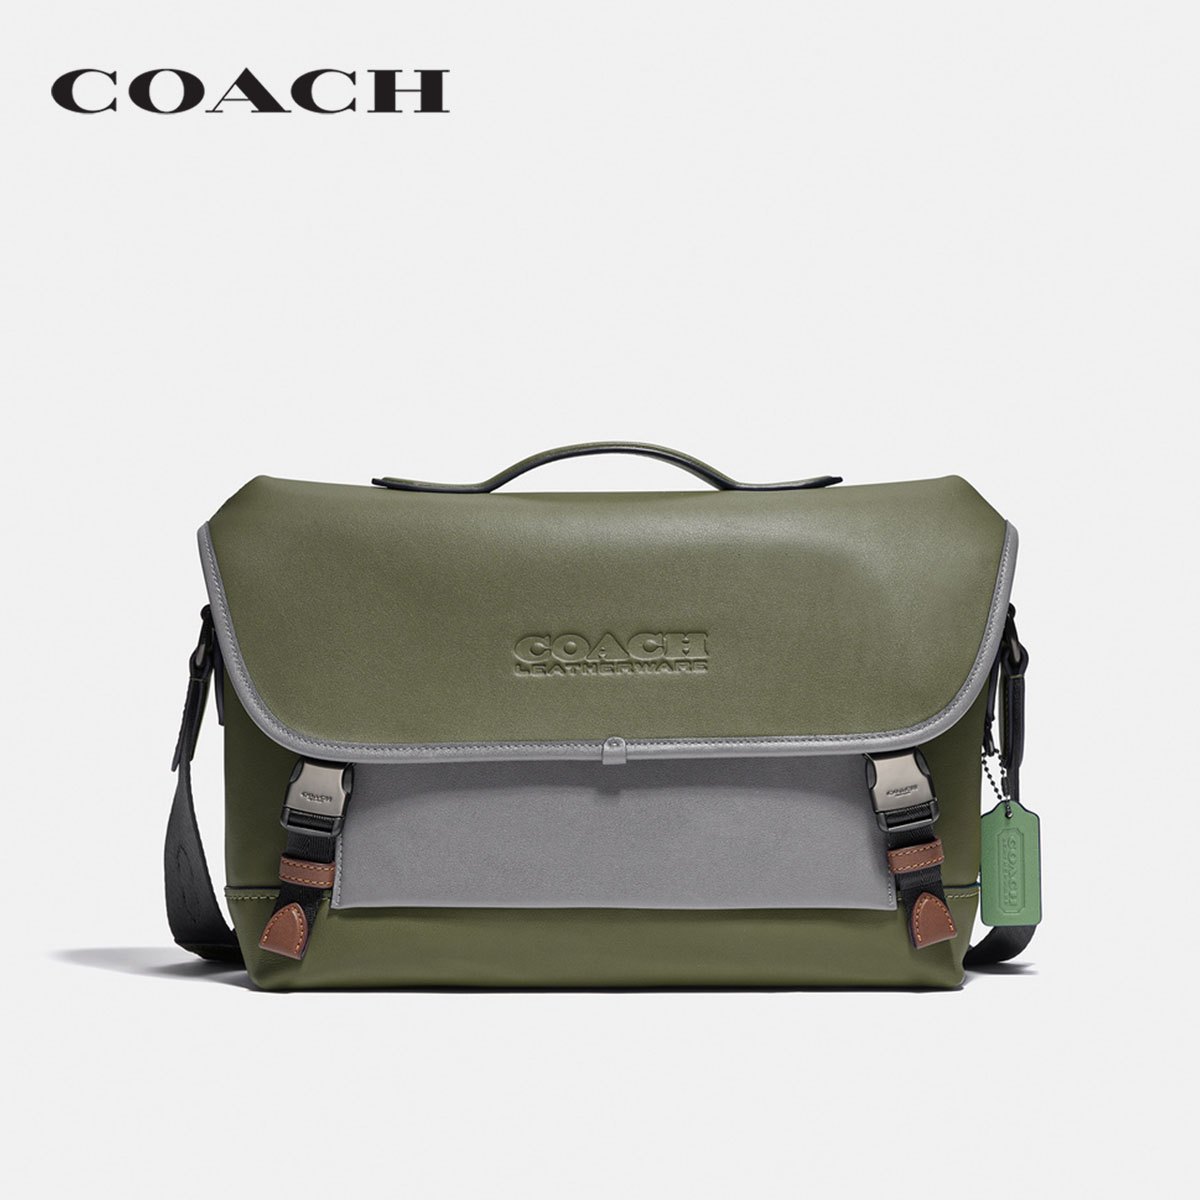 COACH LEAGUE BIKE BAG IN COLORBLOCK COC2665 JISB3 กระเป๋าสะพายข้าง